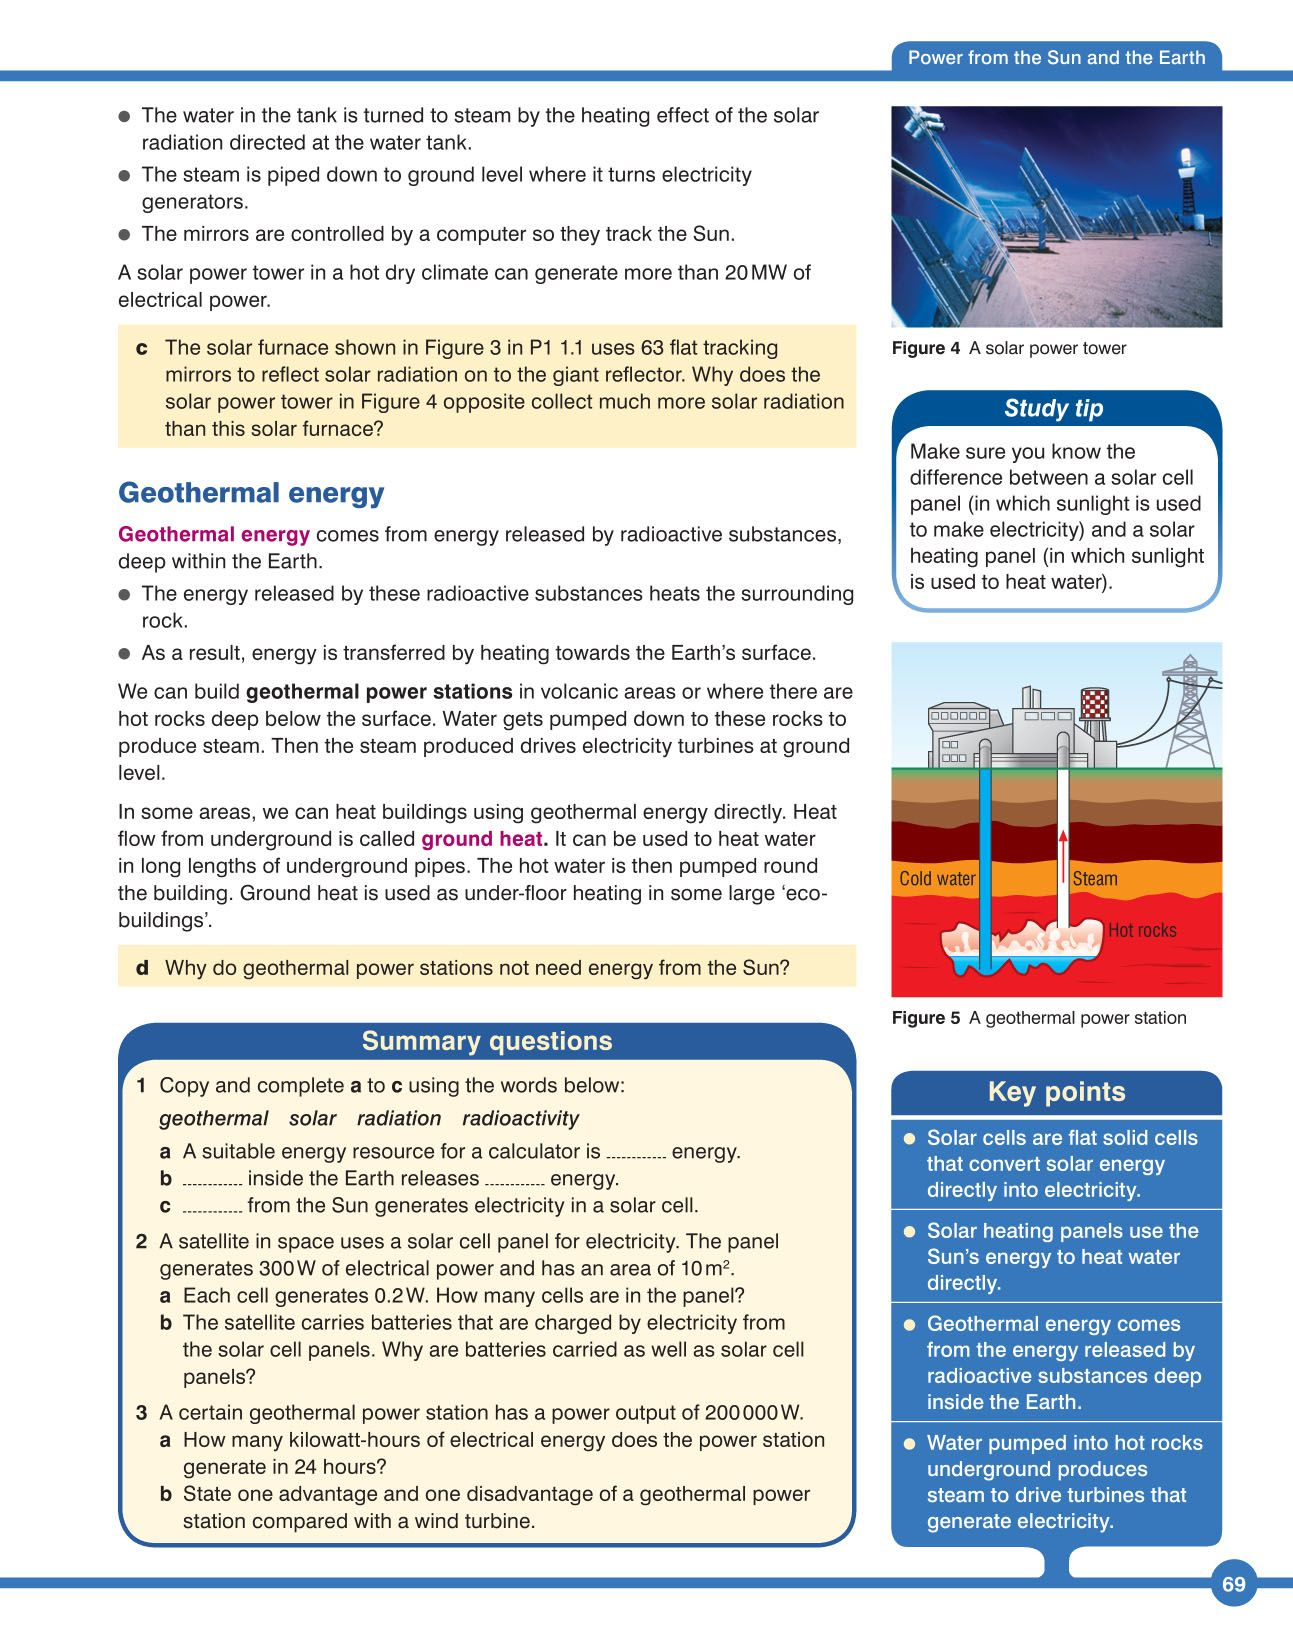 Physics GCSE for AQA Kerboodle Book | FUNNY...Physics | Pinterest ...